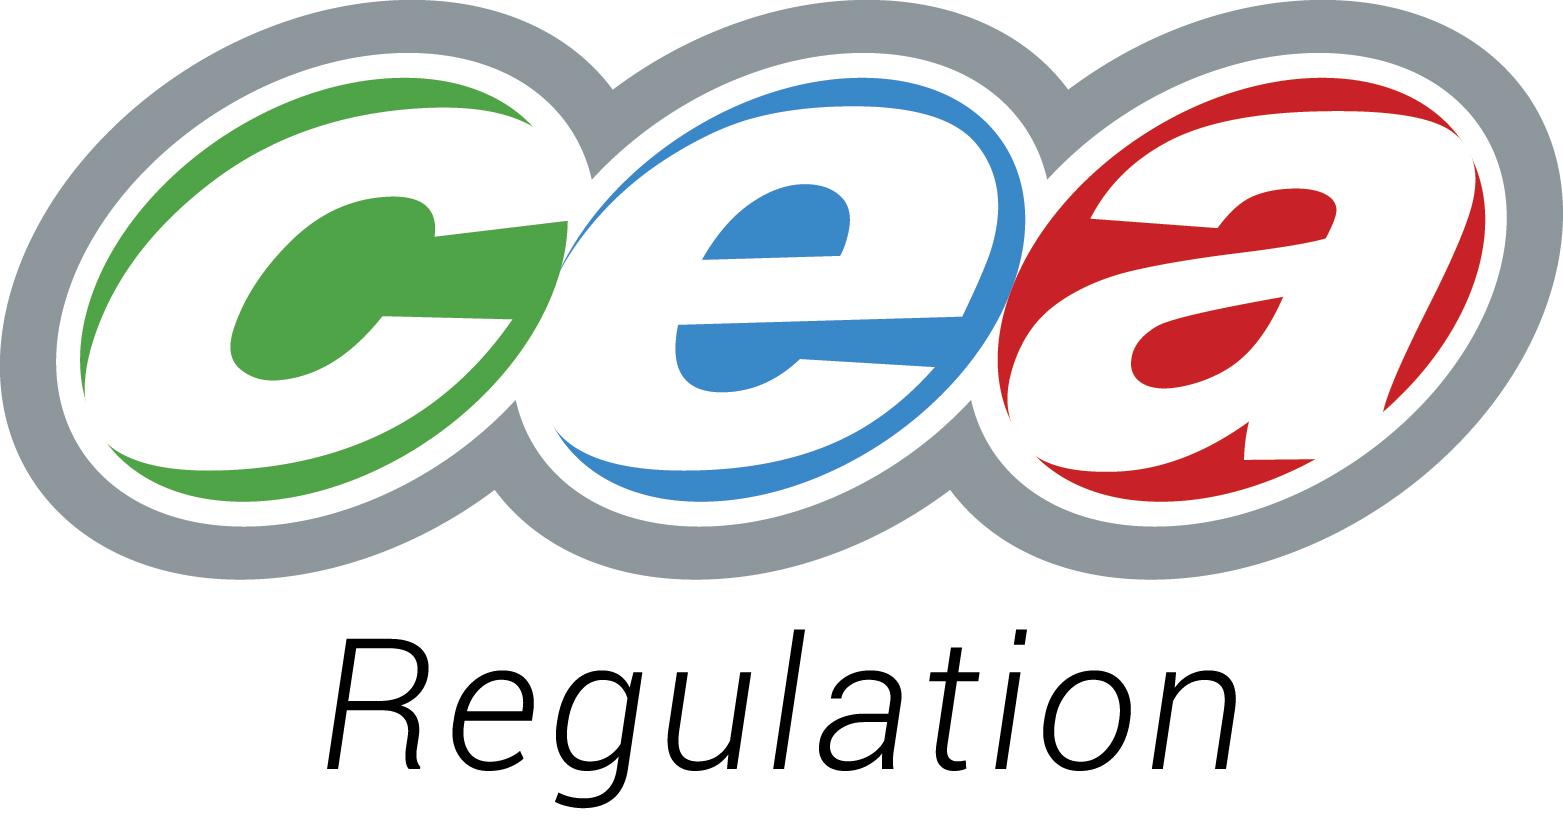 CCEA_Regulation_Logo_web.jpg